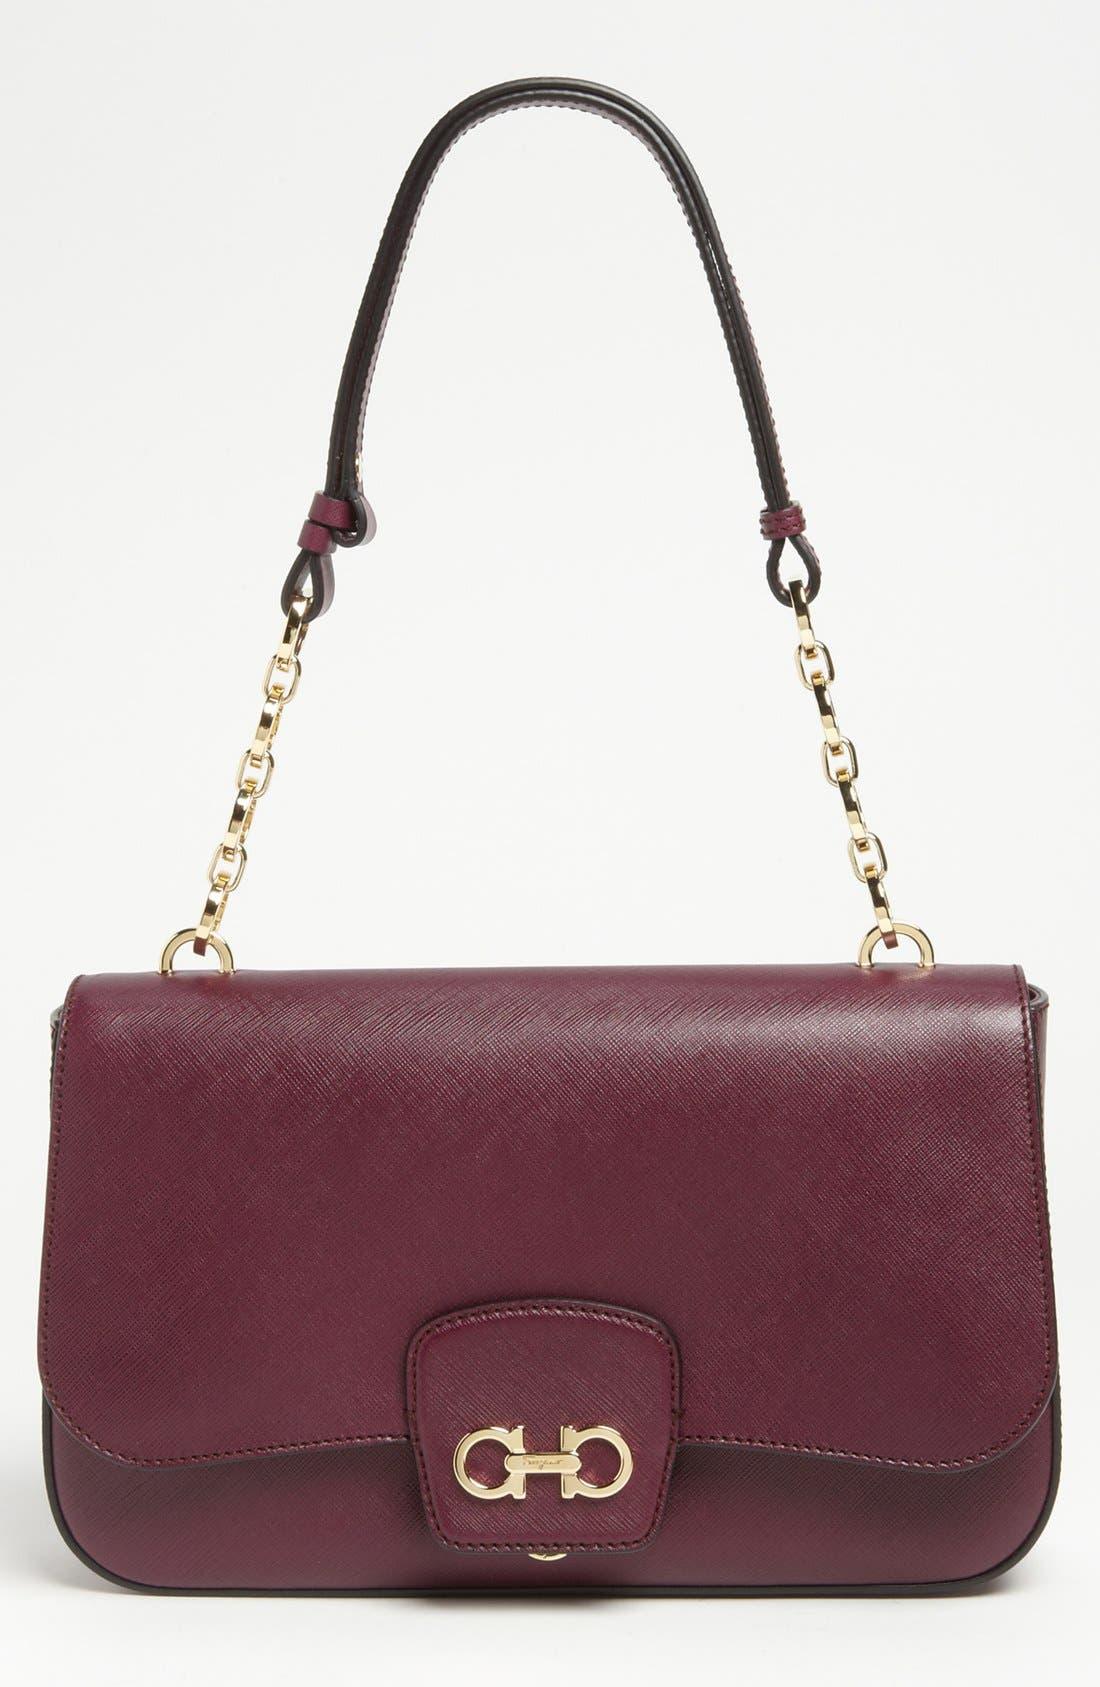 Alternate Image 1 Selected - Salvatore Ferragamo 'Bree' Leather Shoulder Bag